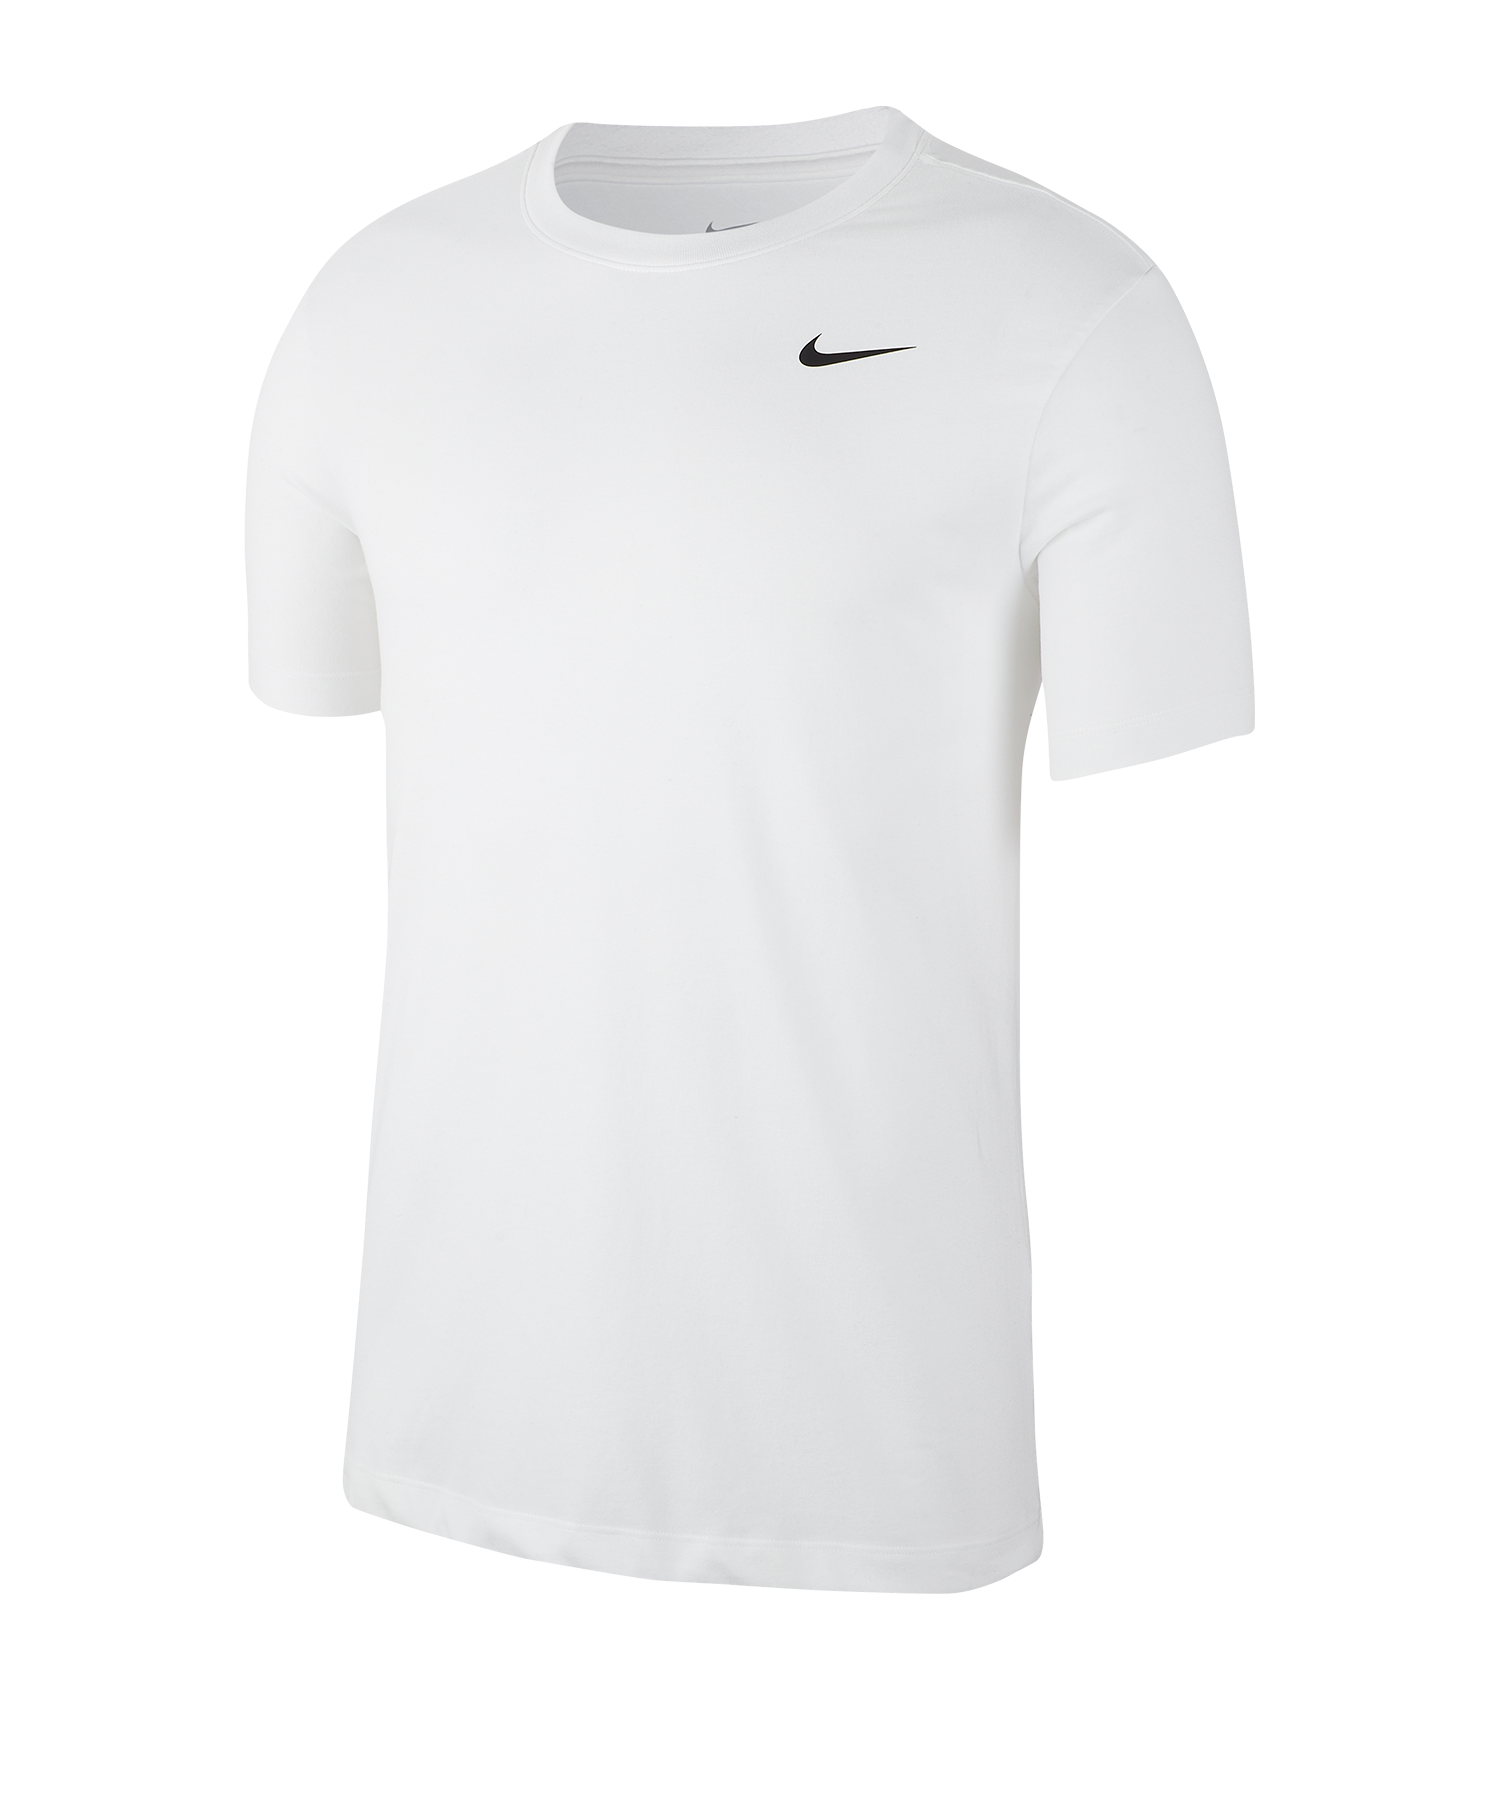 nike trainingstop t-shirt weiss f100   kurzarm